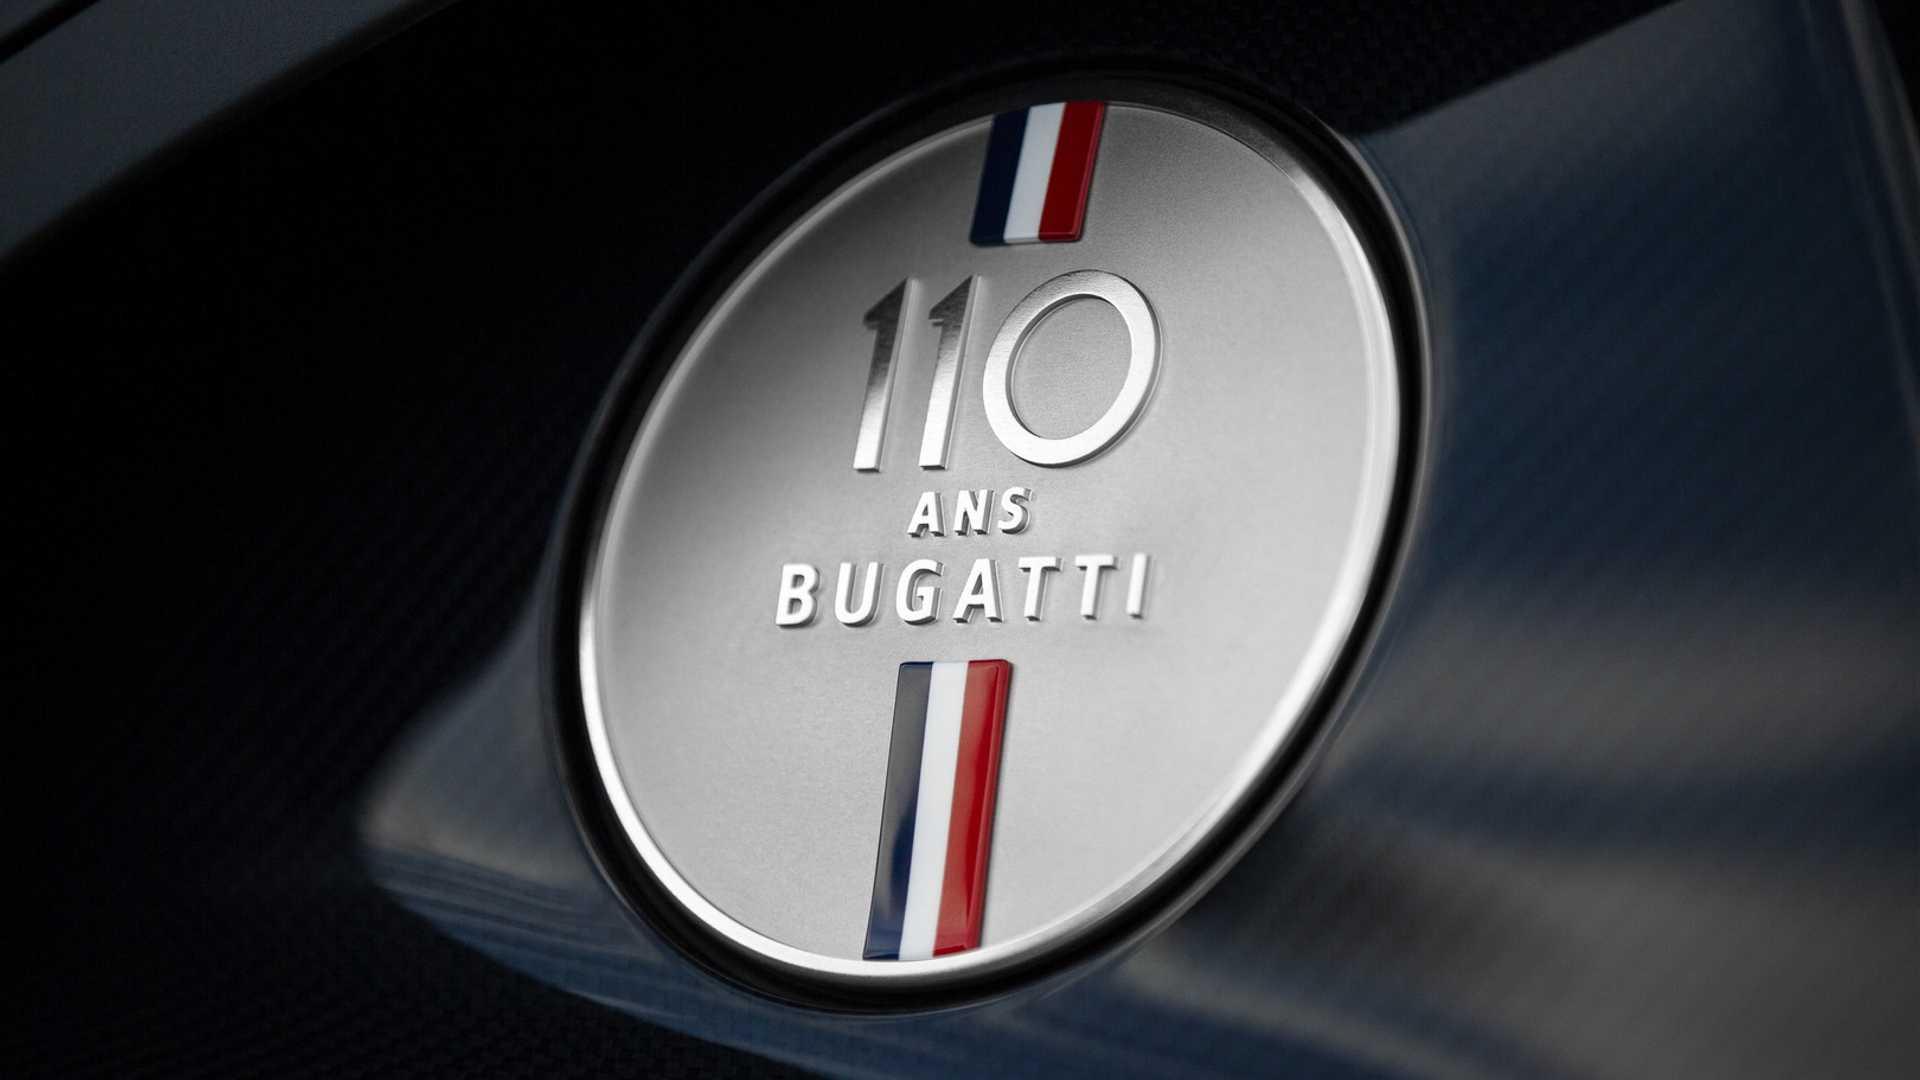 bugatti-chiron-sport-110-ans-bugatti (7)